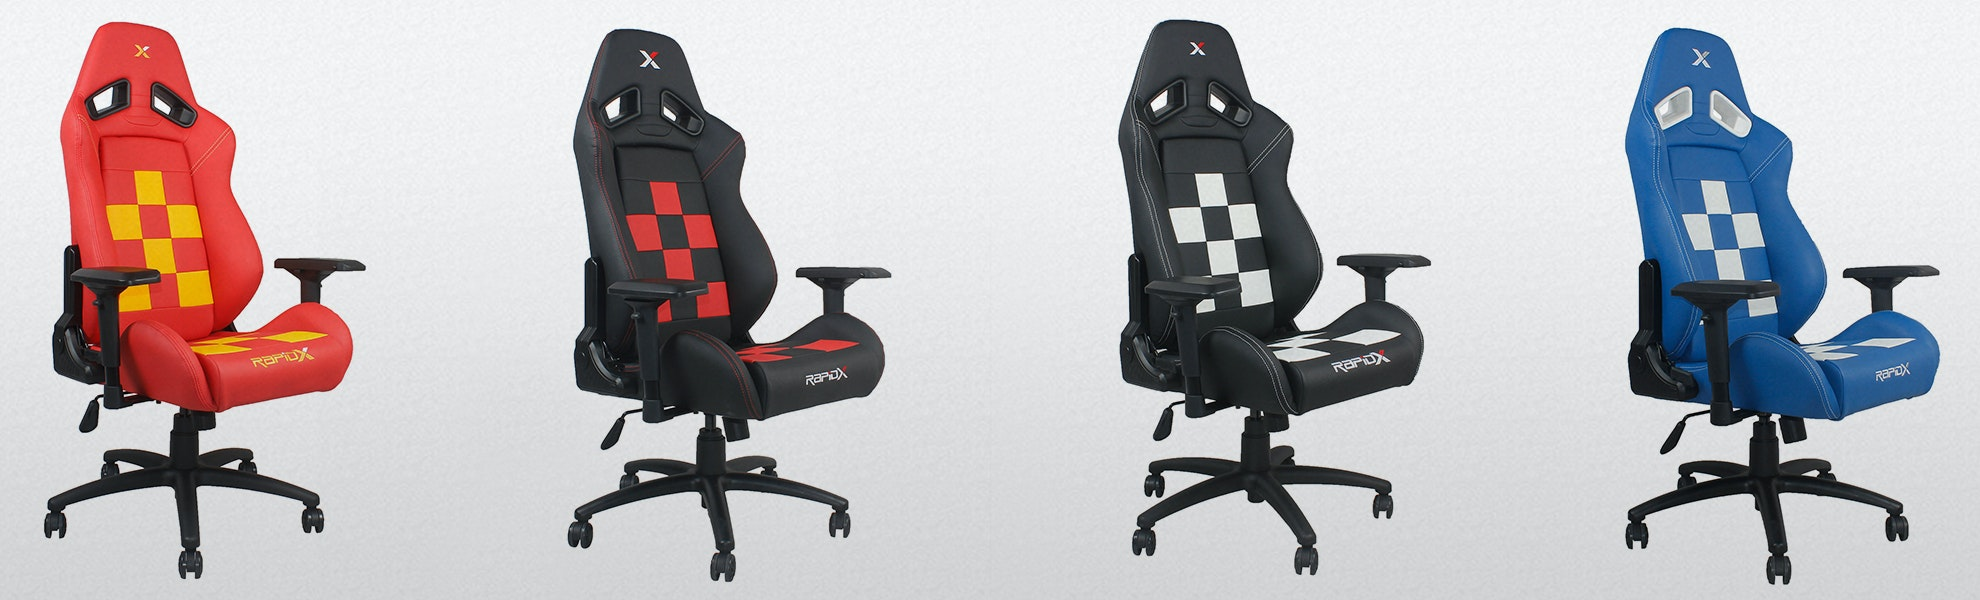 RapidX Finish Line Gaming Chair